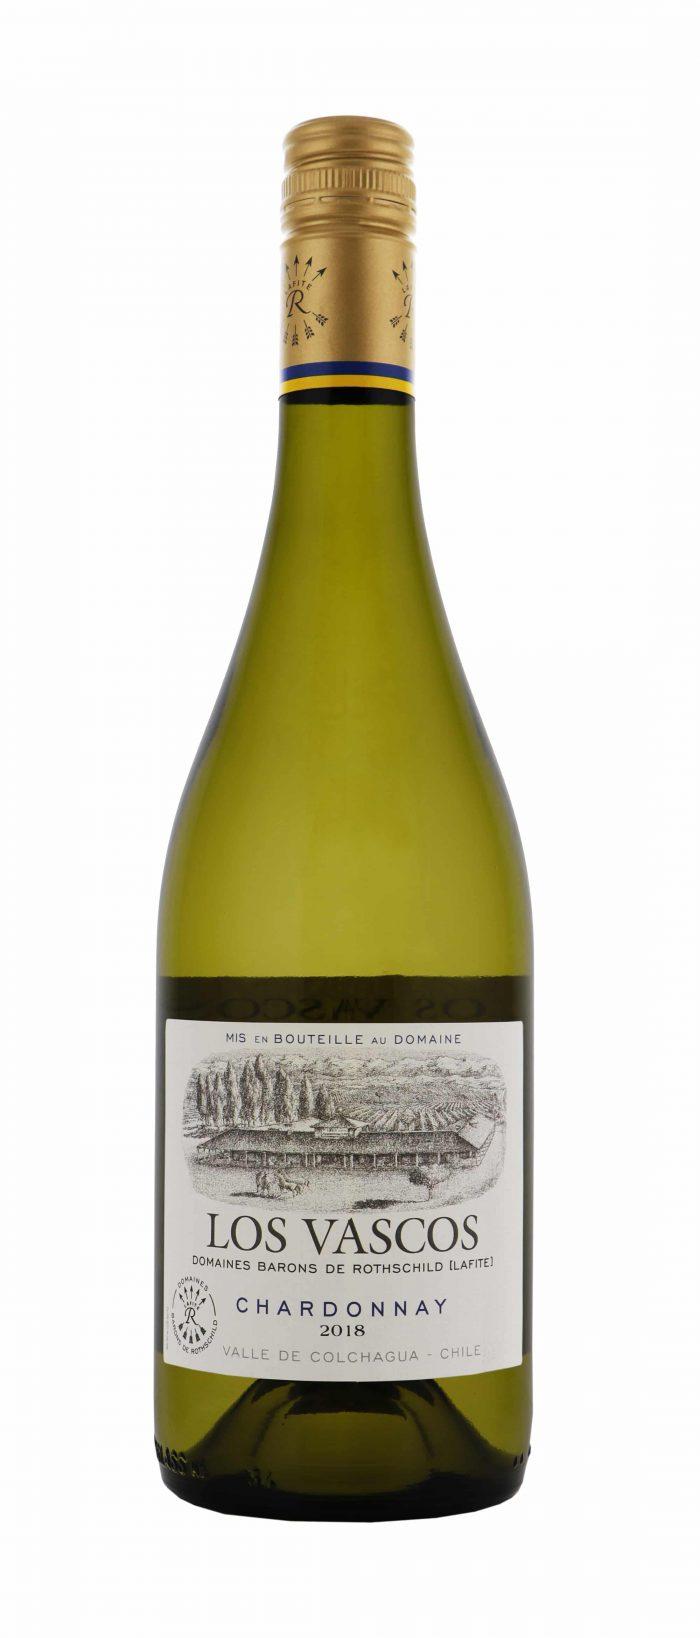 Los Vascos – Chardonnay   Chili   gemaakt van de druif: Chardonnay